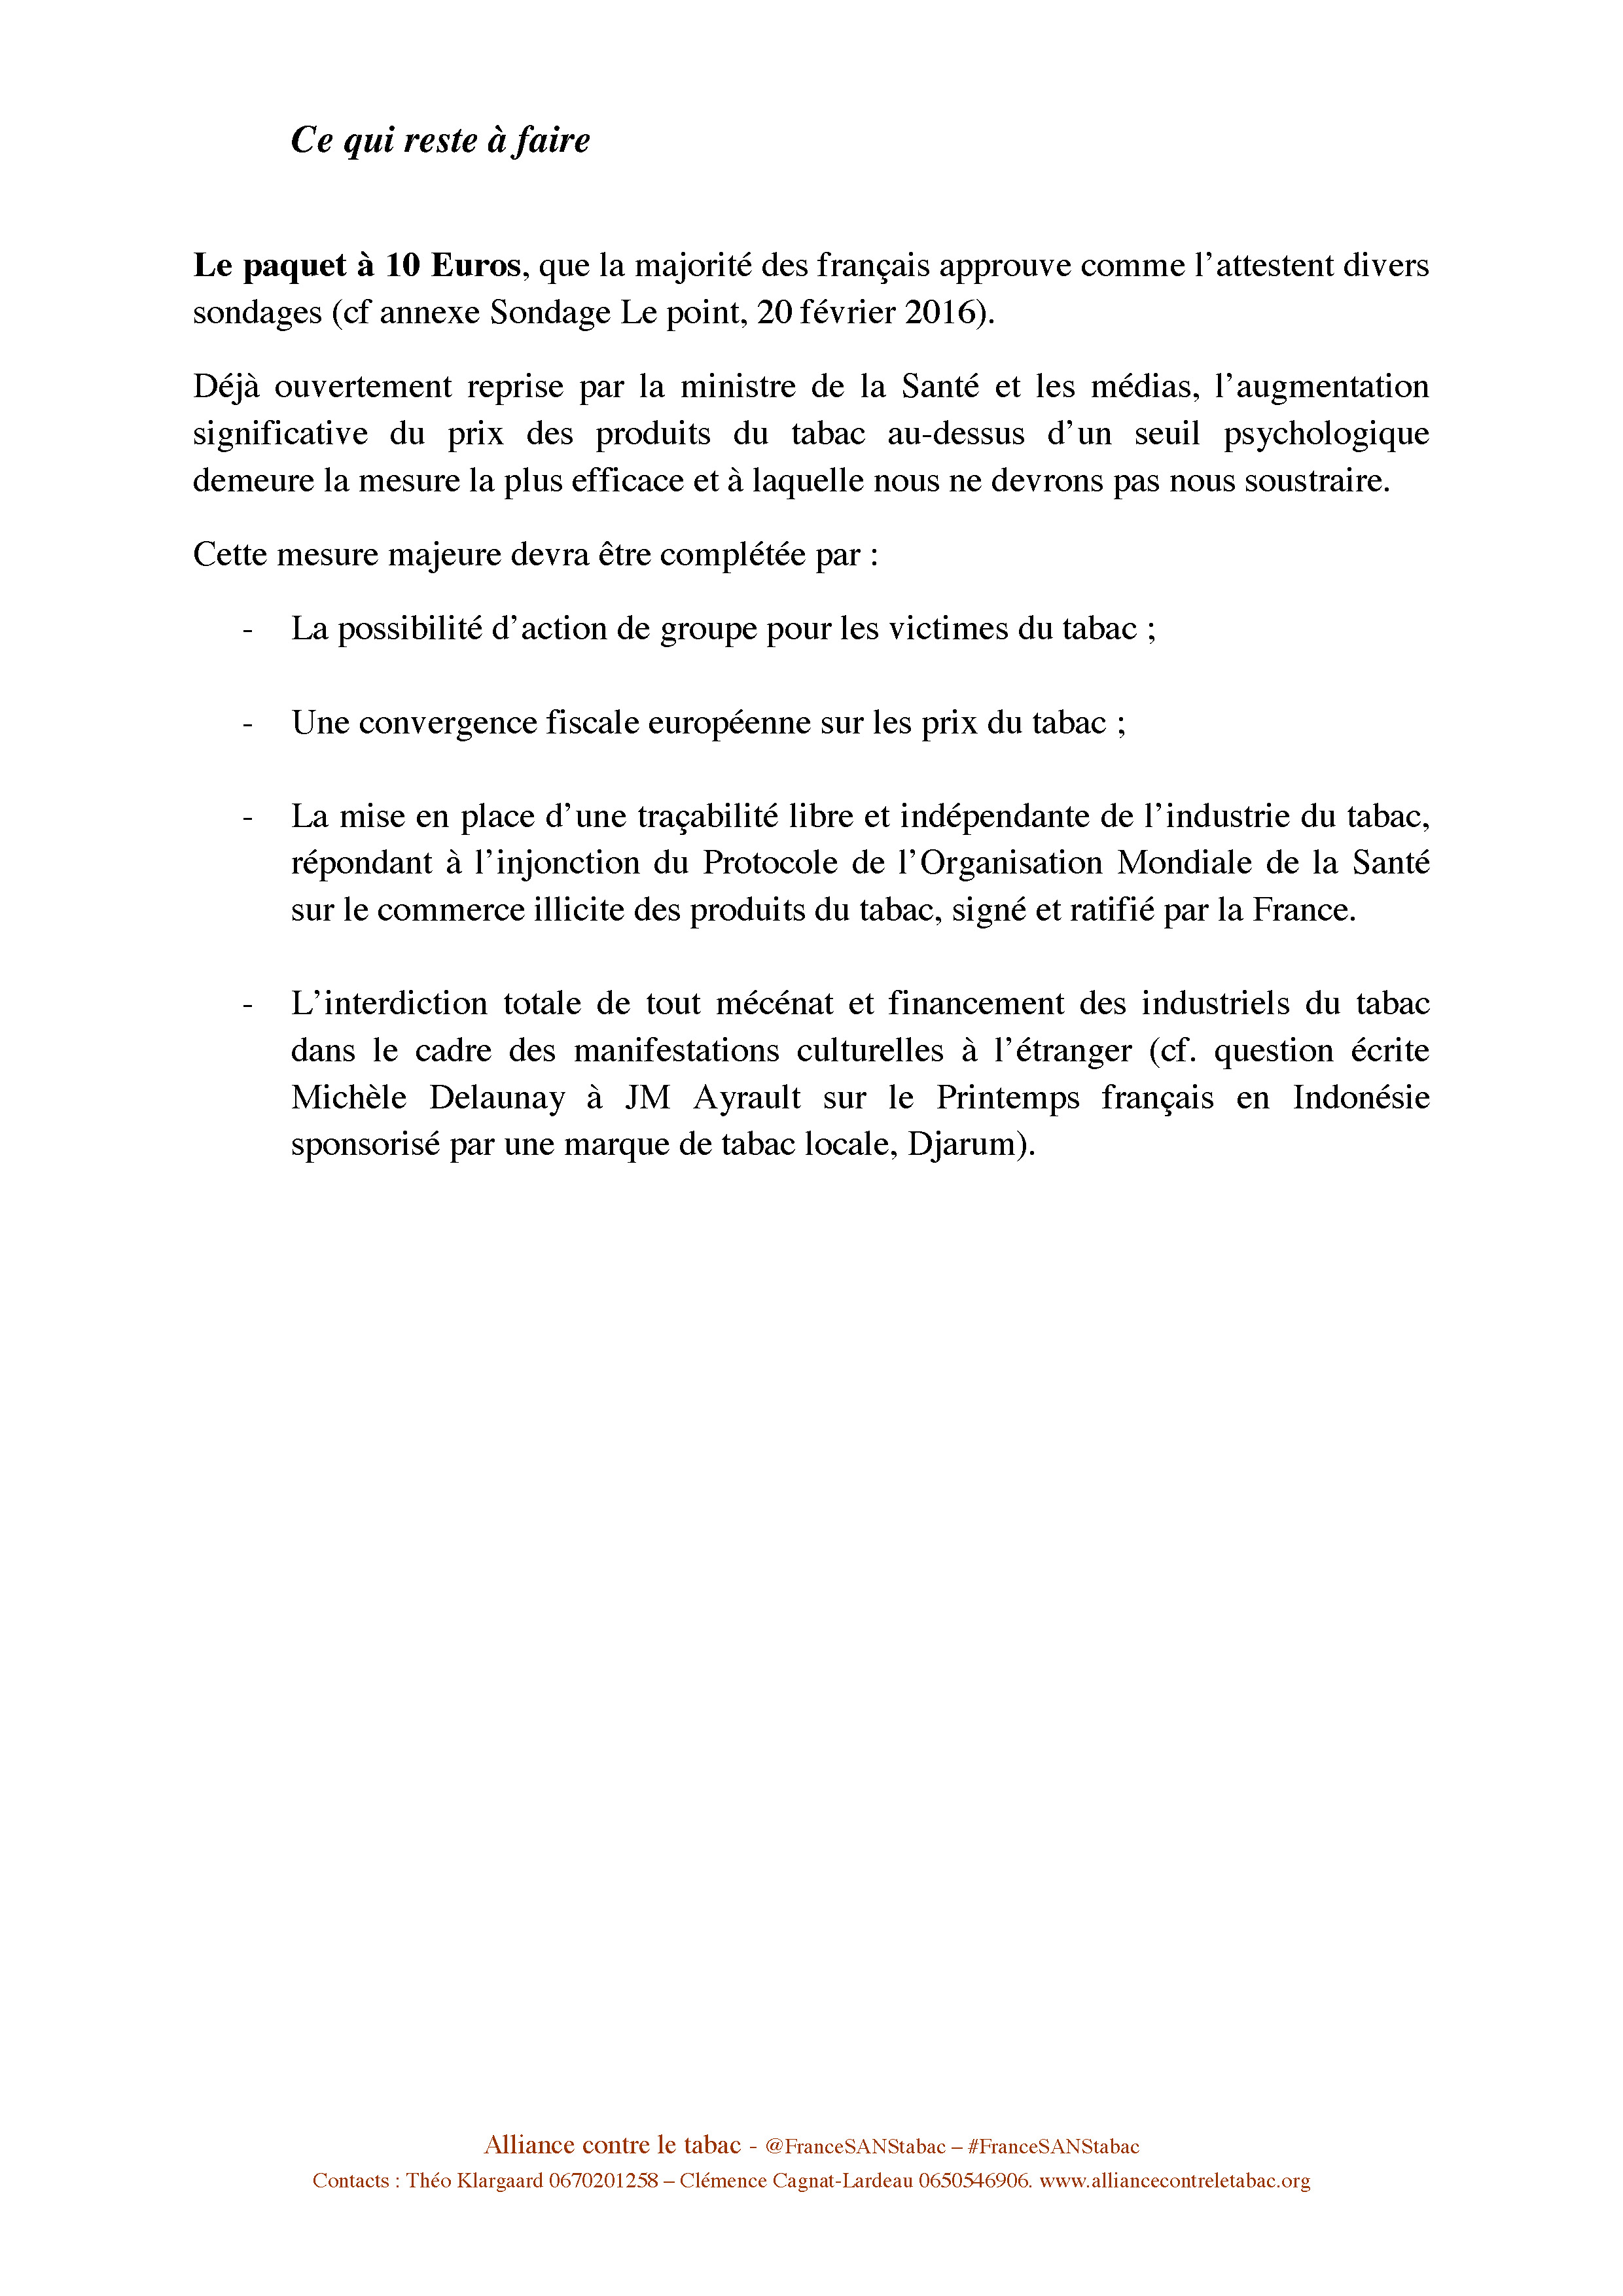 Alliance-DP_journee-mondiale-sans-tabac-avec-annexes-vf-30mai2016_Page_03.jpg